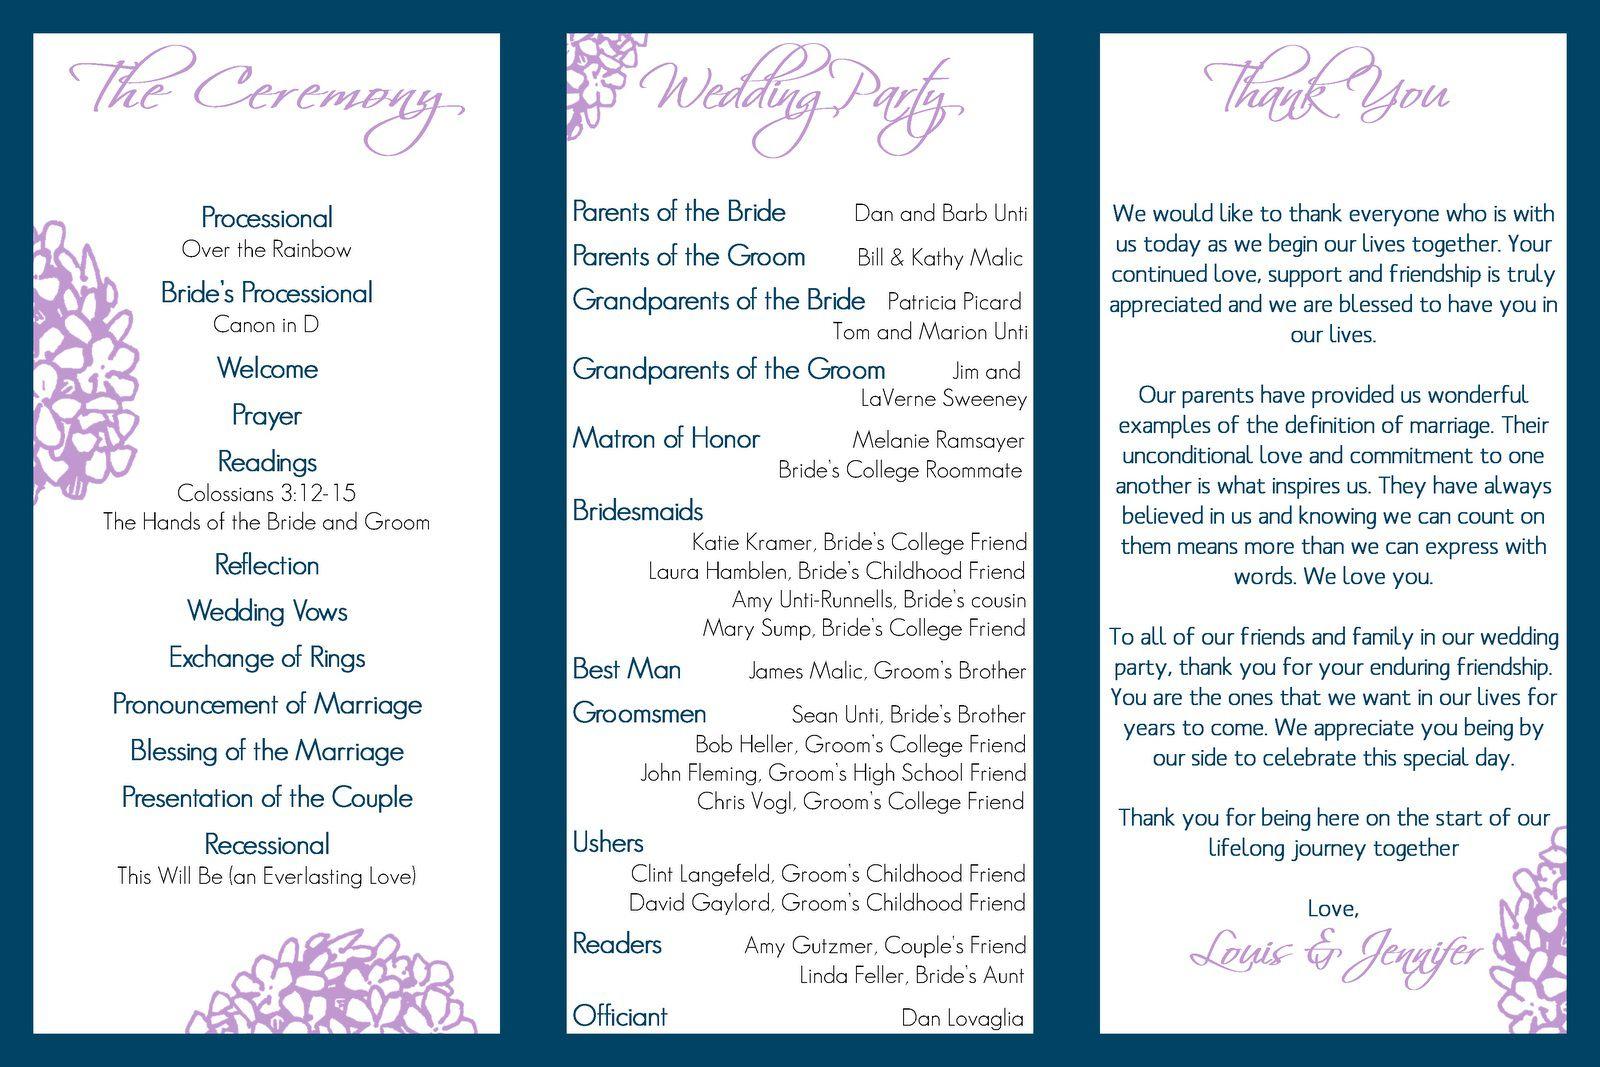 004 Stupendou Trifold Wedding Program Template Example  Templates Tri Fold Tri-fold Publisher Free FoldableFull